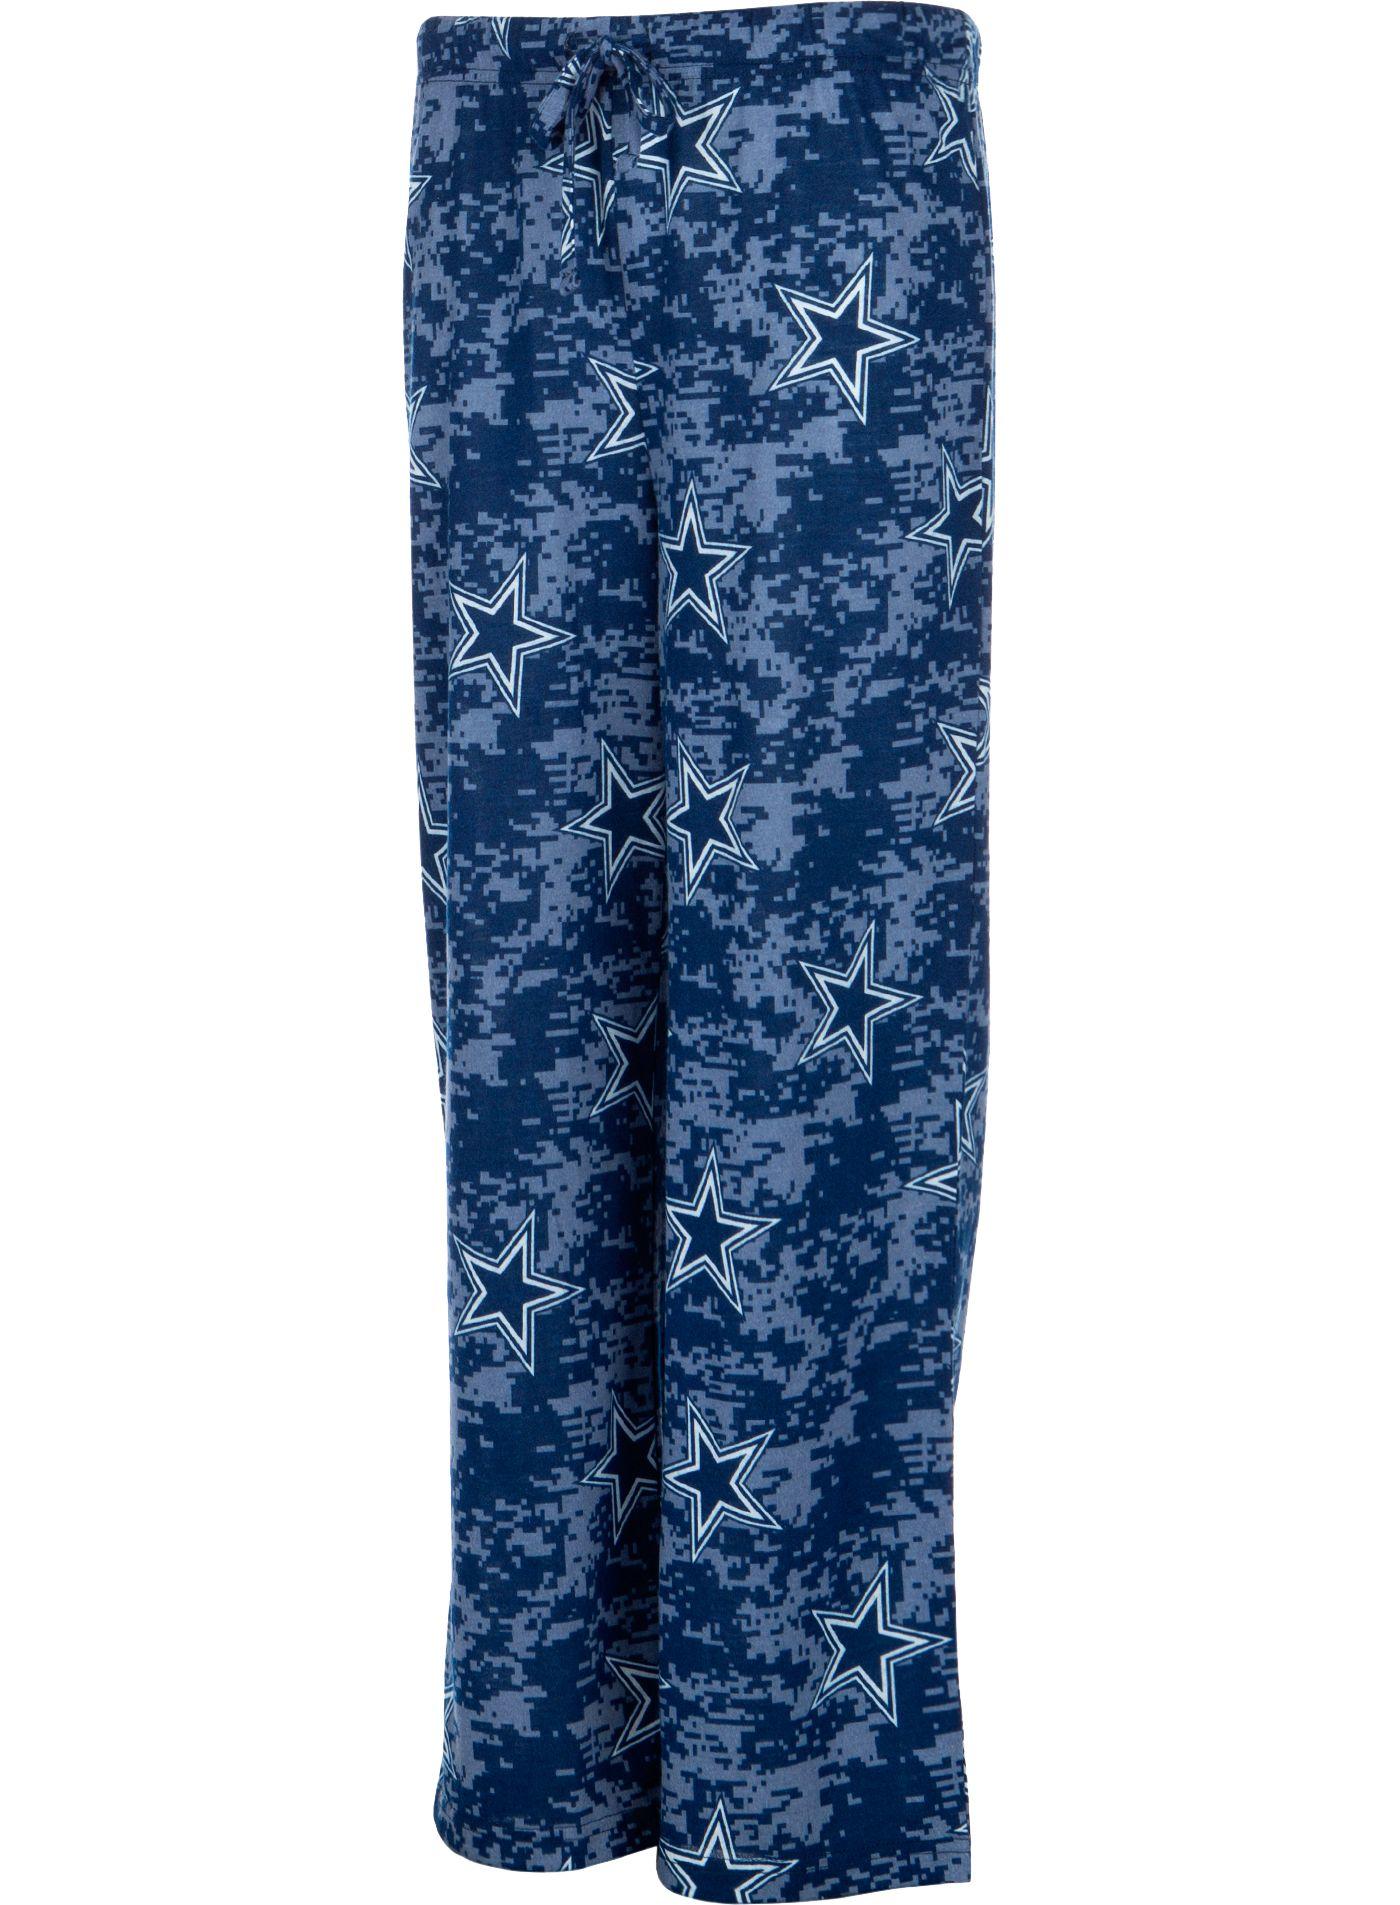 Dallas Cowboys Merchandising Youth Tallow Navy Pants